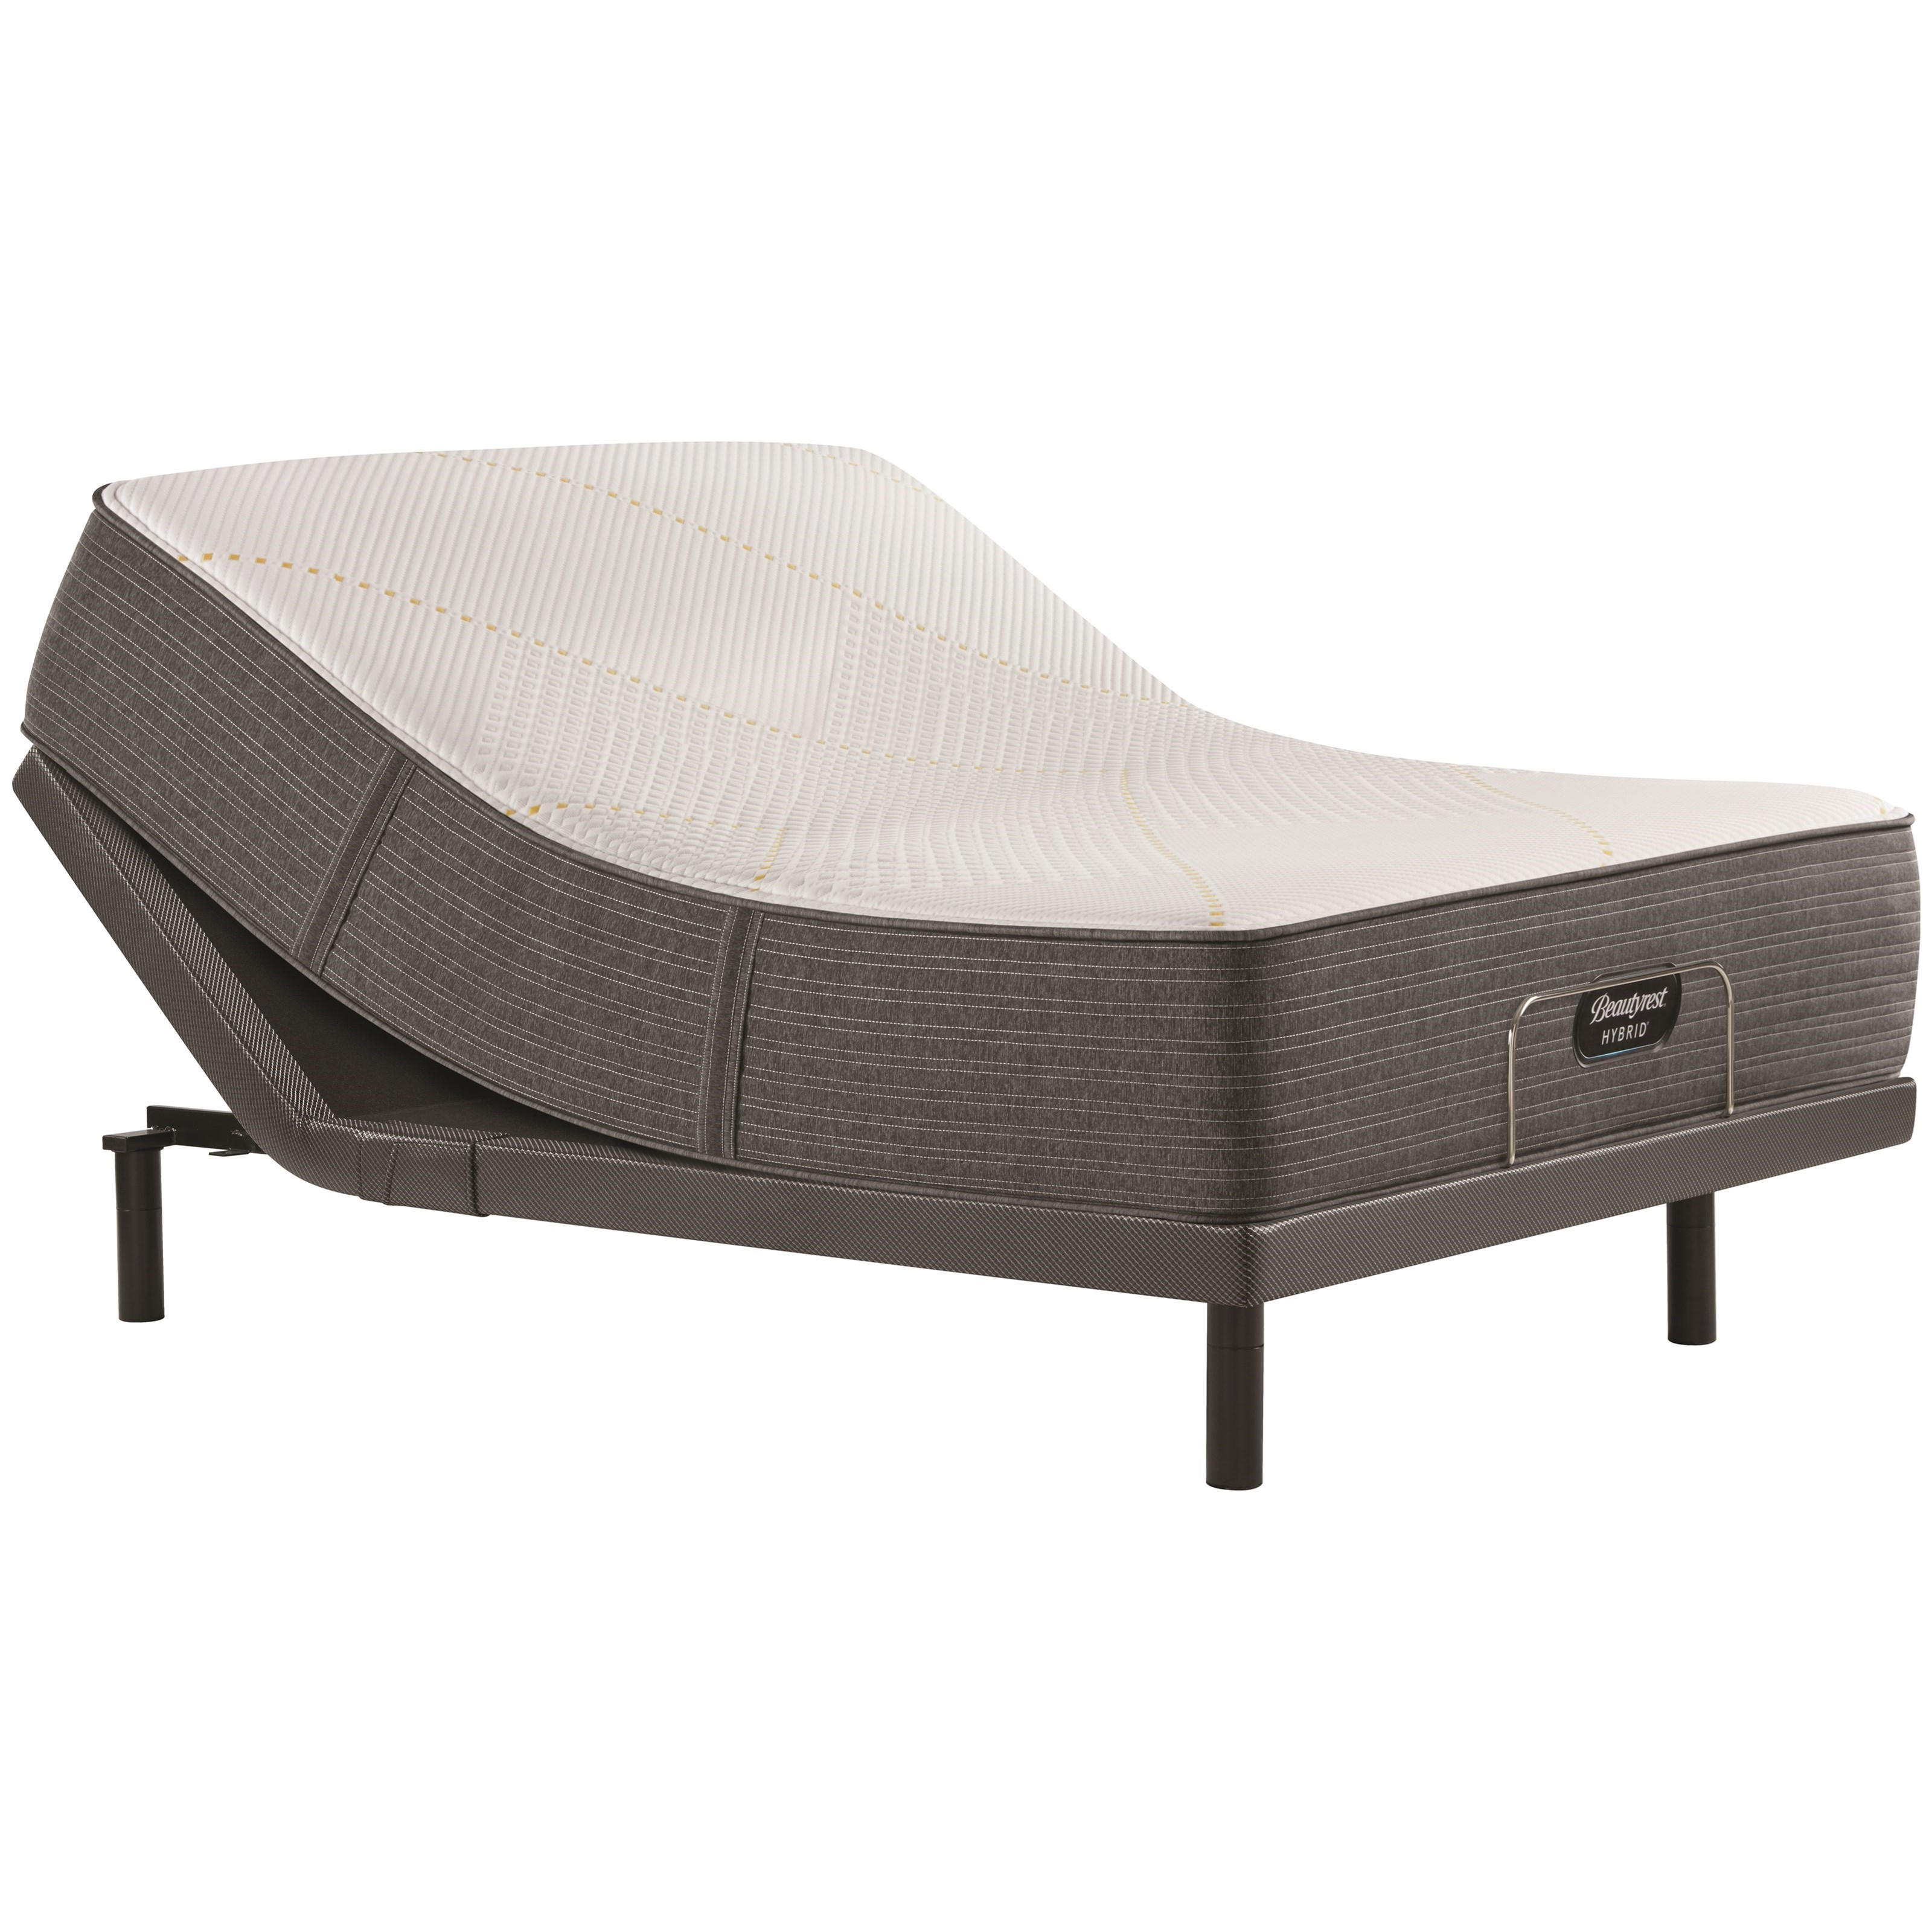 "Beautyrest Hybrid 3000 Ultra Plush King 14 1/2"" Hybrid Adj Set by Beautyrest at Gill Brothers Furniture"